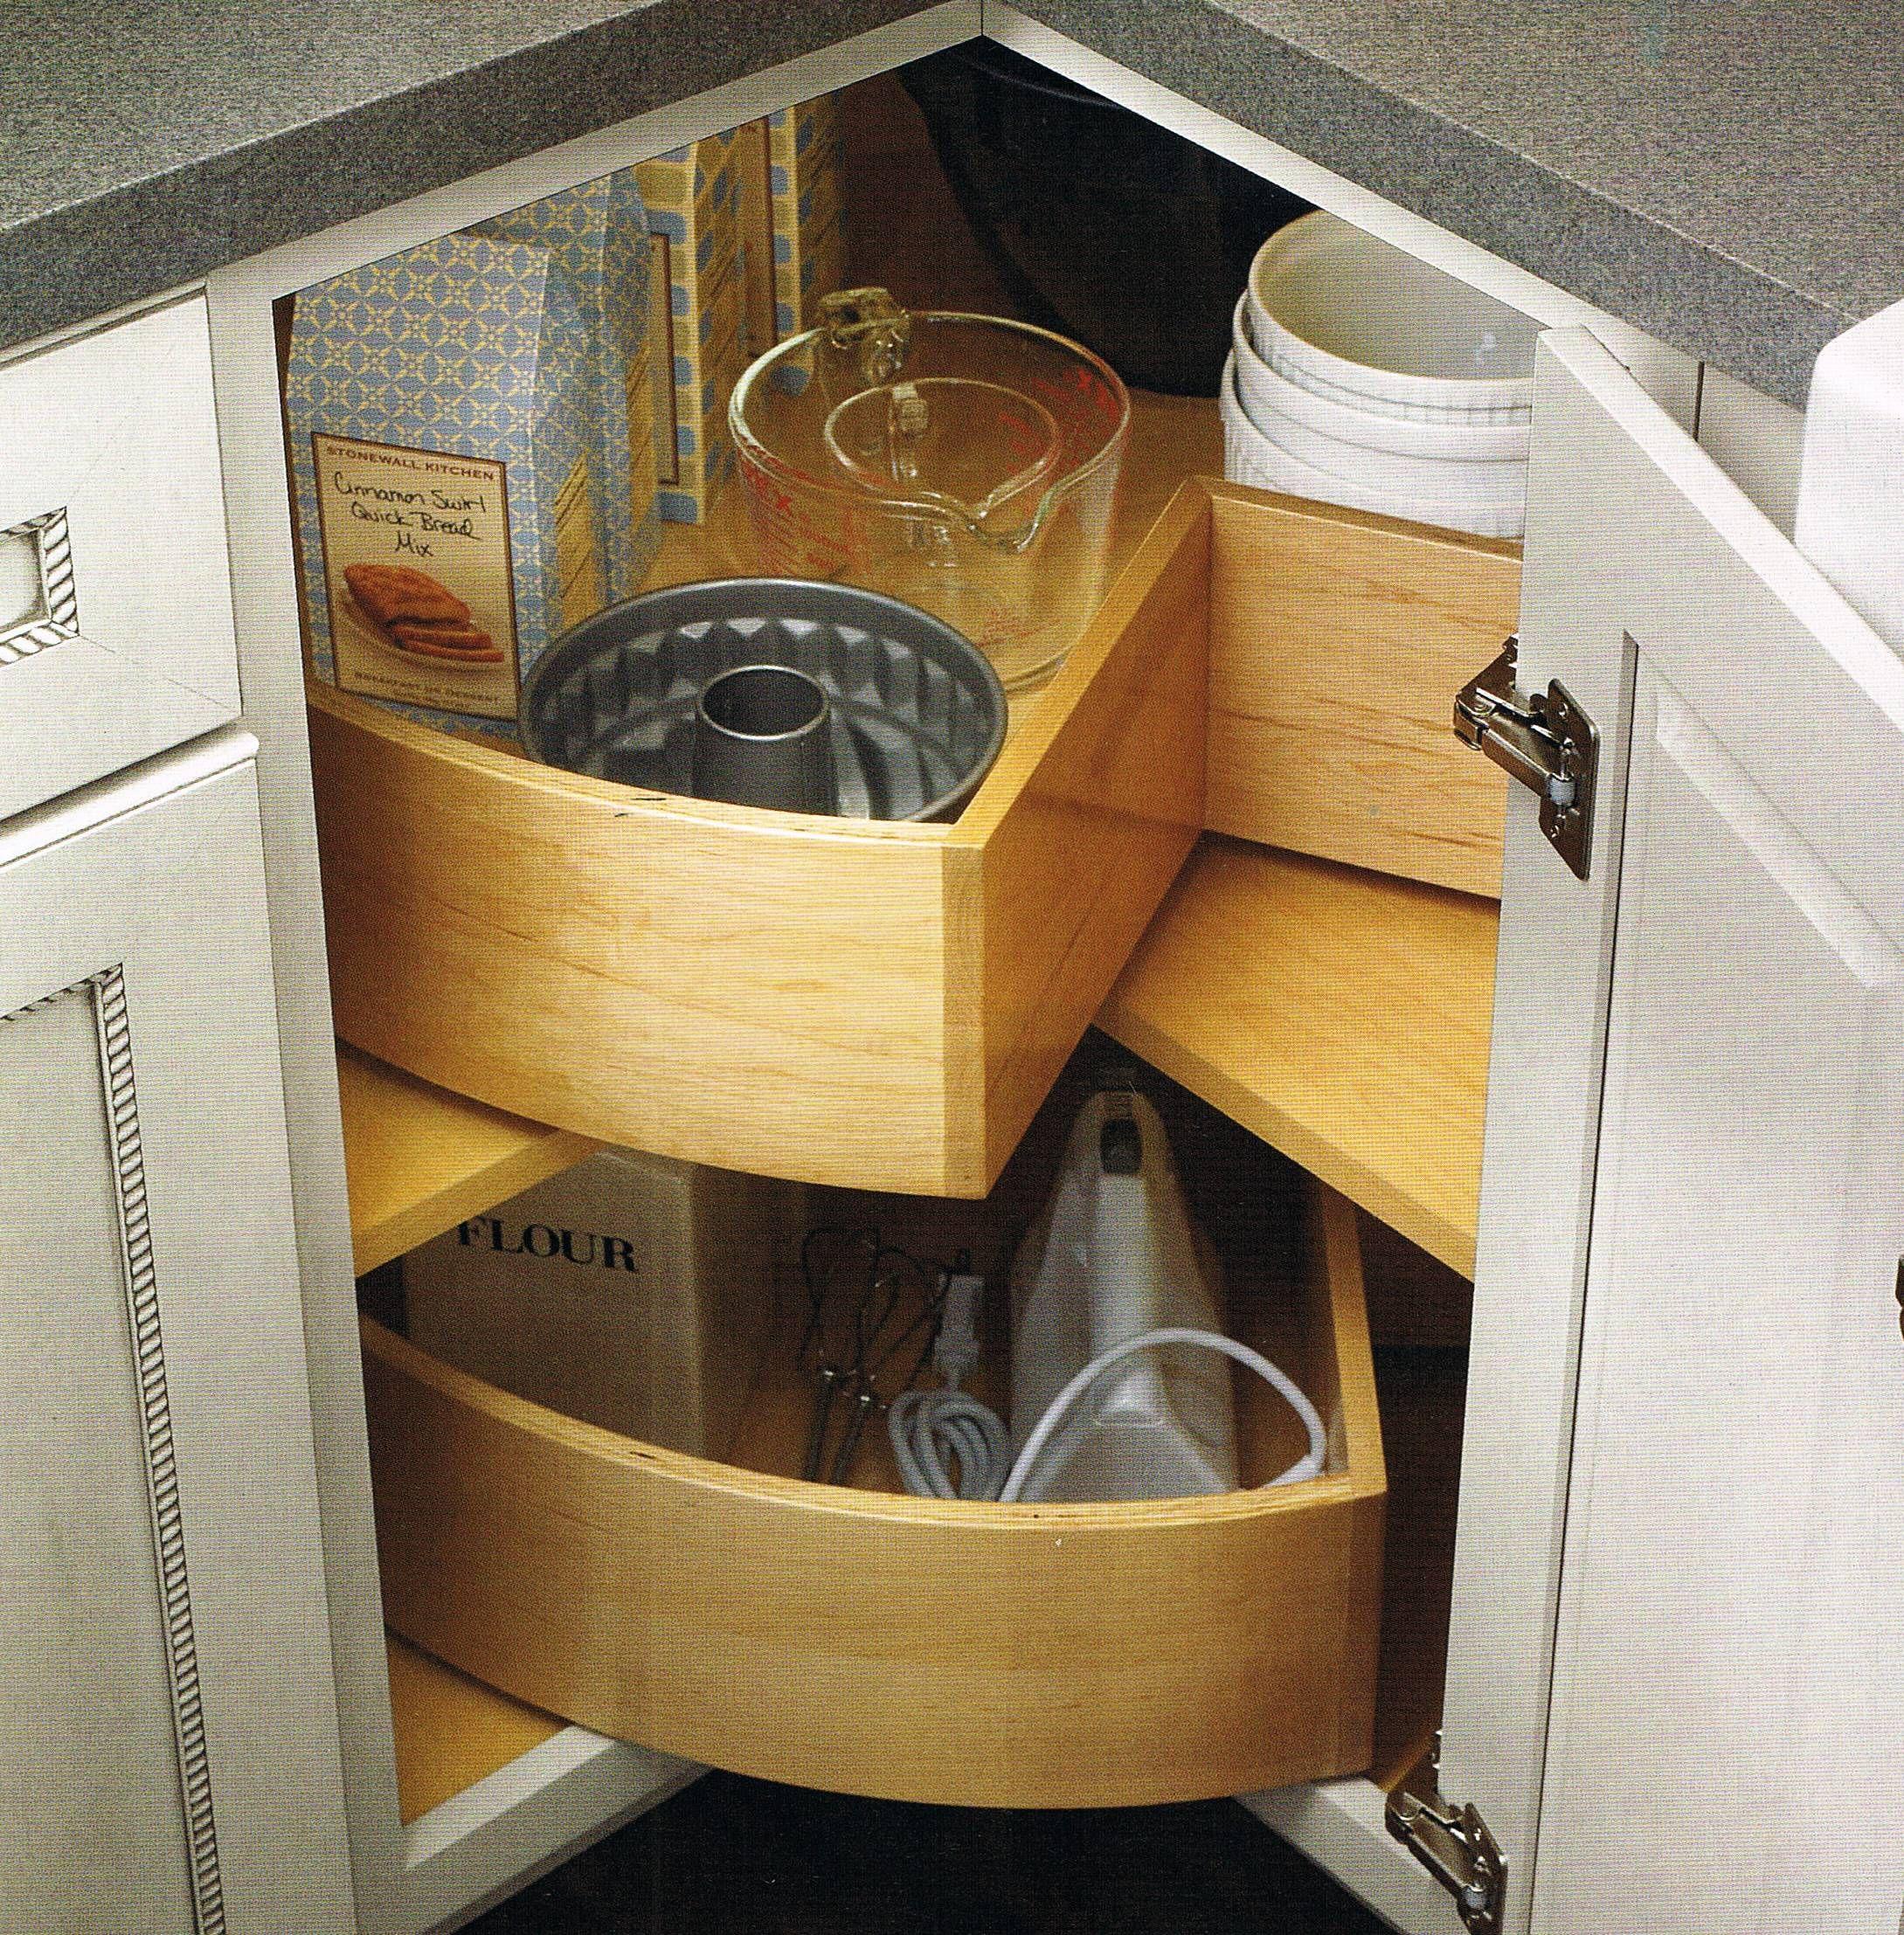 Best Kitchen Gallery: Kitchen Cabi Storage Solutions Kitchen Corner Storage of Corner Kitchen Cabinet Solutions on cal-ite.com